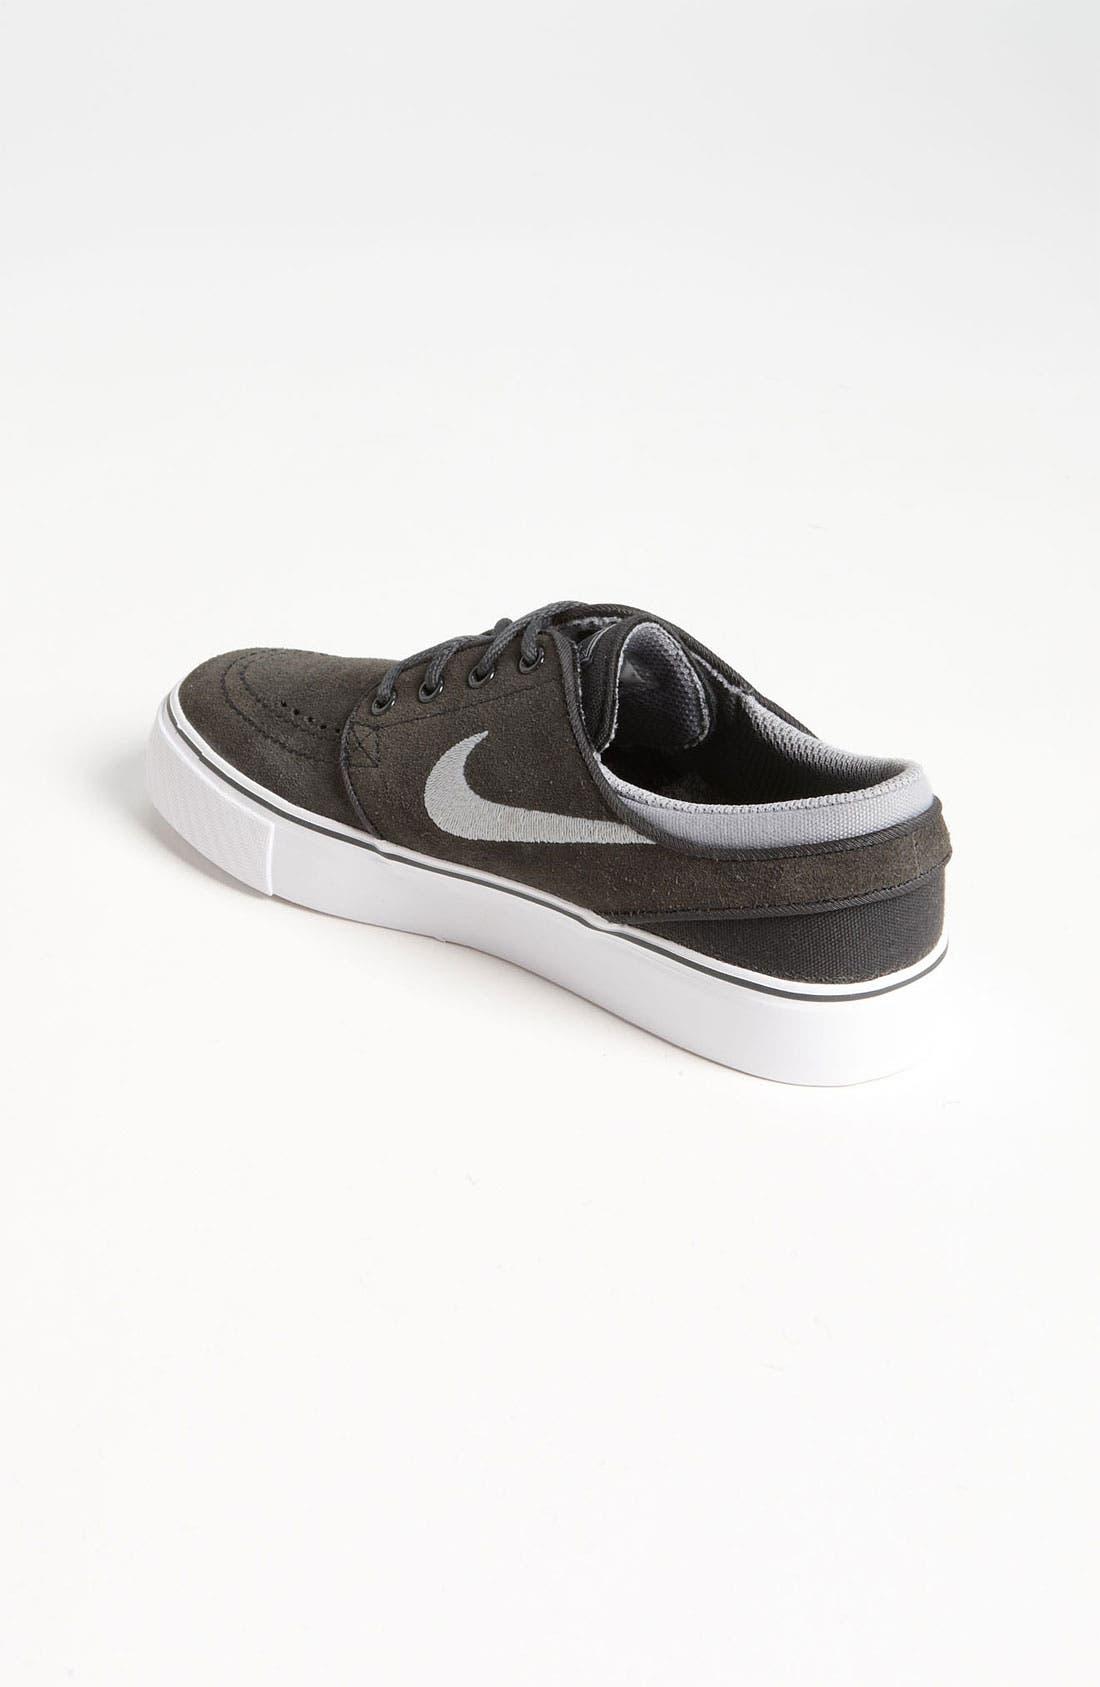 'Stefan Janoski' Sneaker,                             Alternate thumbnail 35, color,